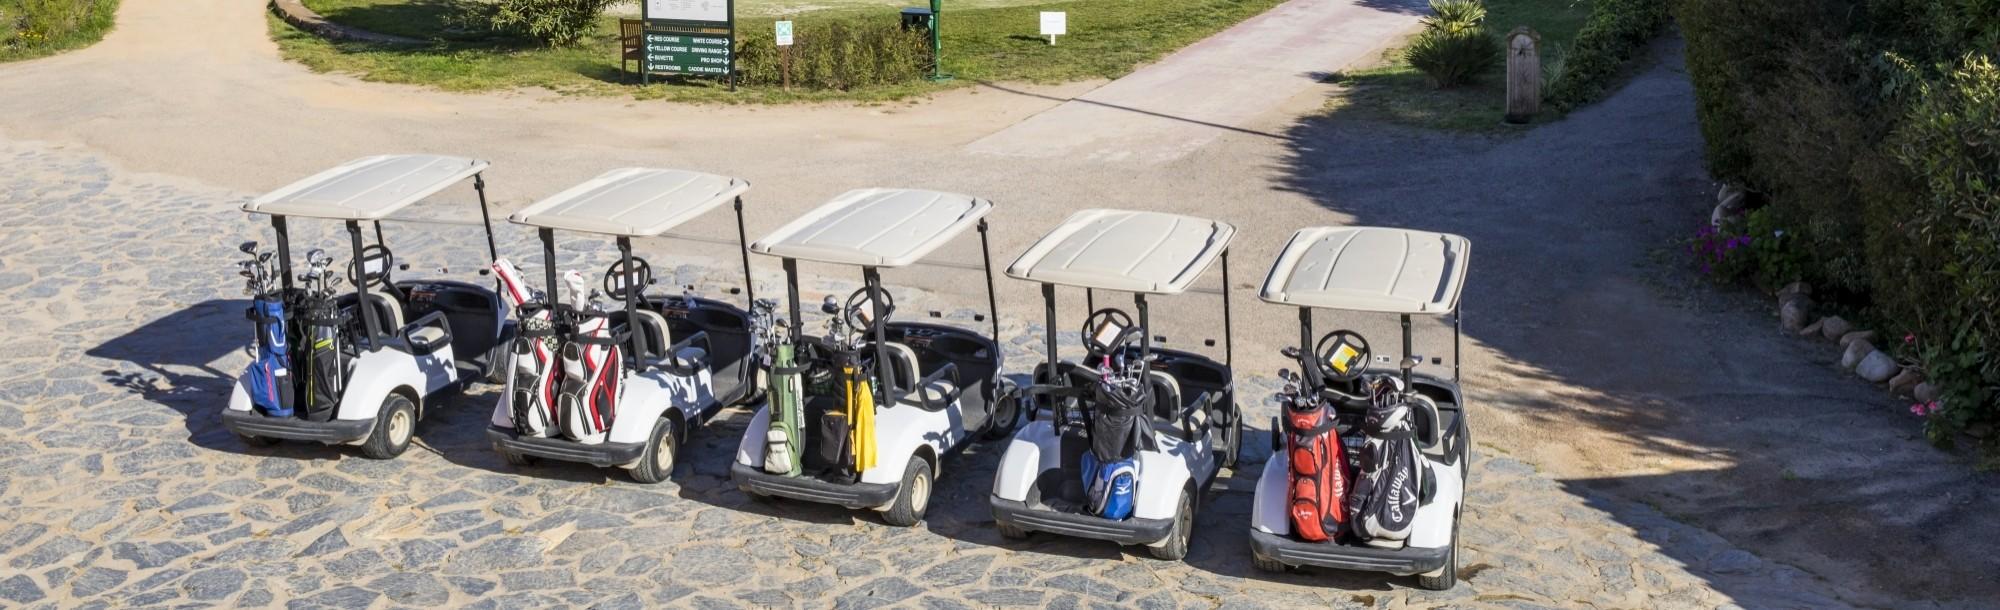 Golf cart campo da golf Is Molas